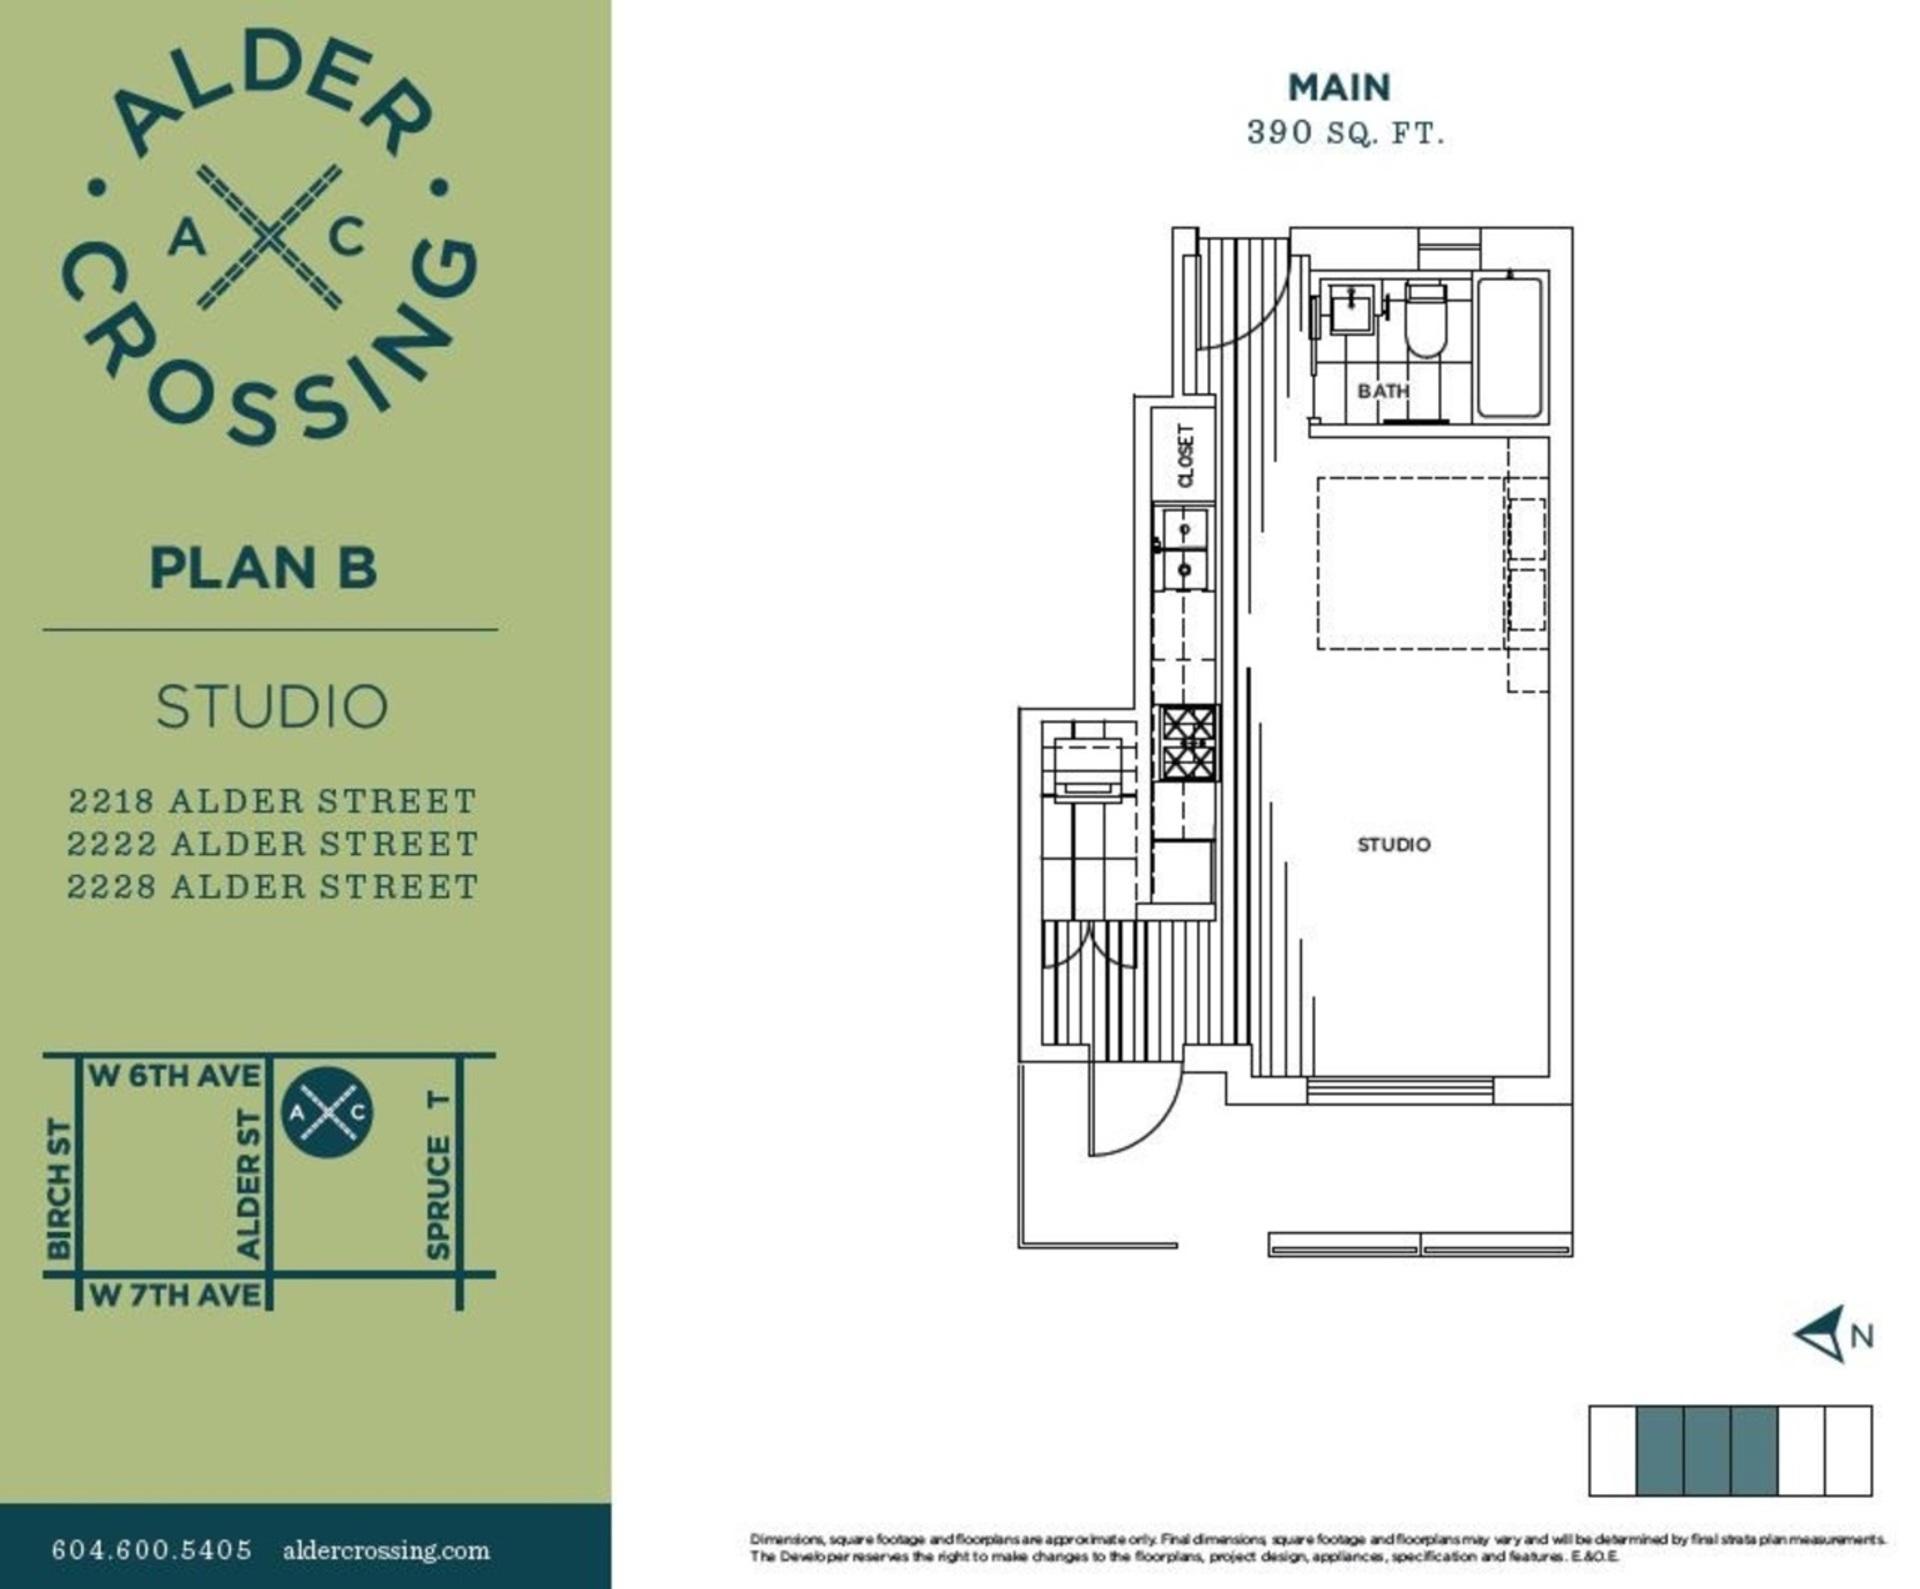 2228-alder-street-fairview-vw-vancouver-west-17 at 2228 Alder Street, Fairview VW, Vancouver West